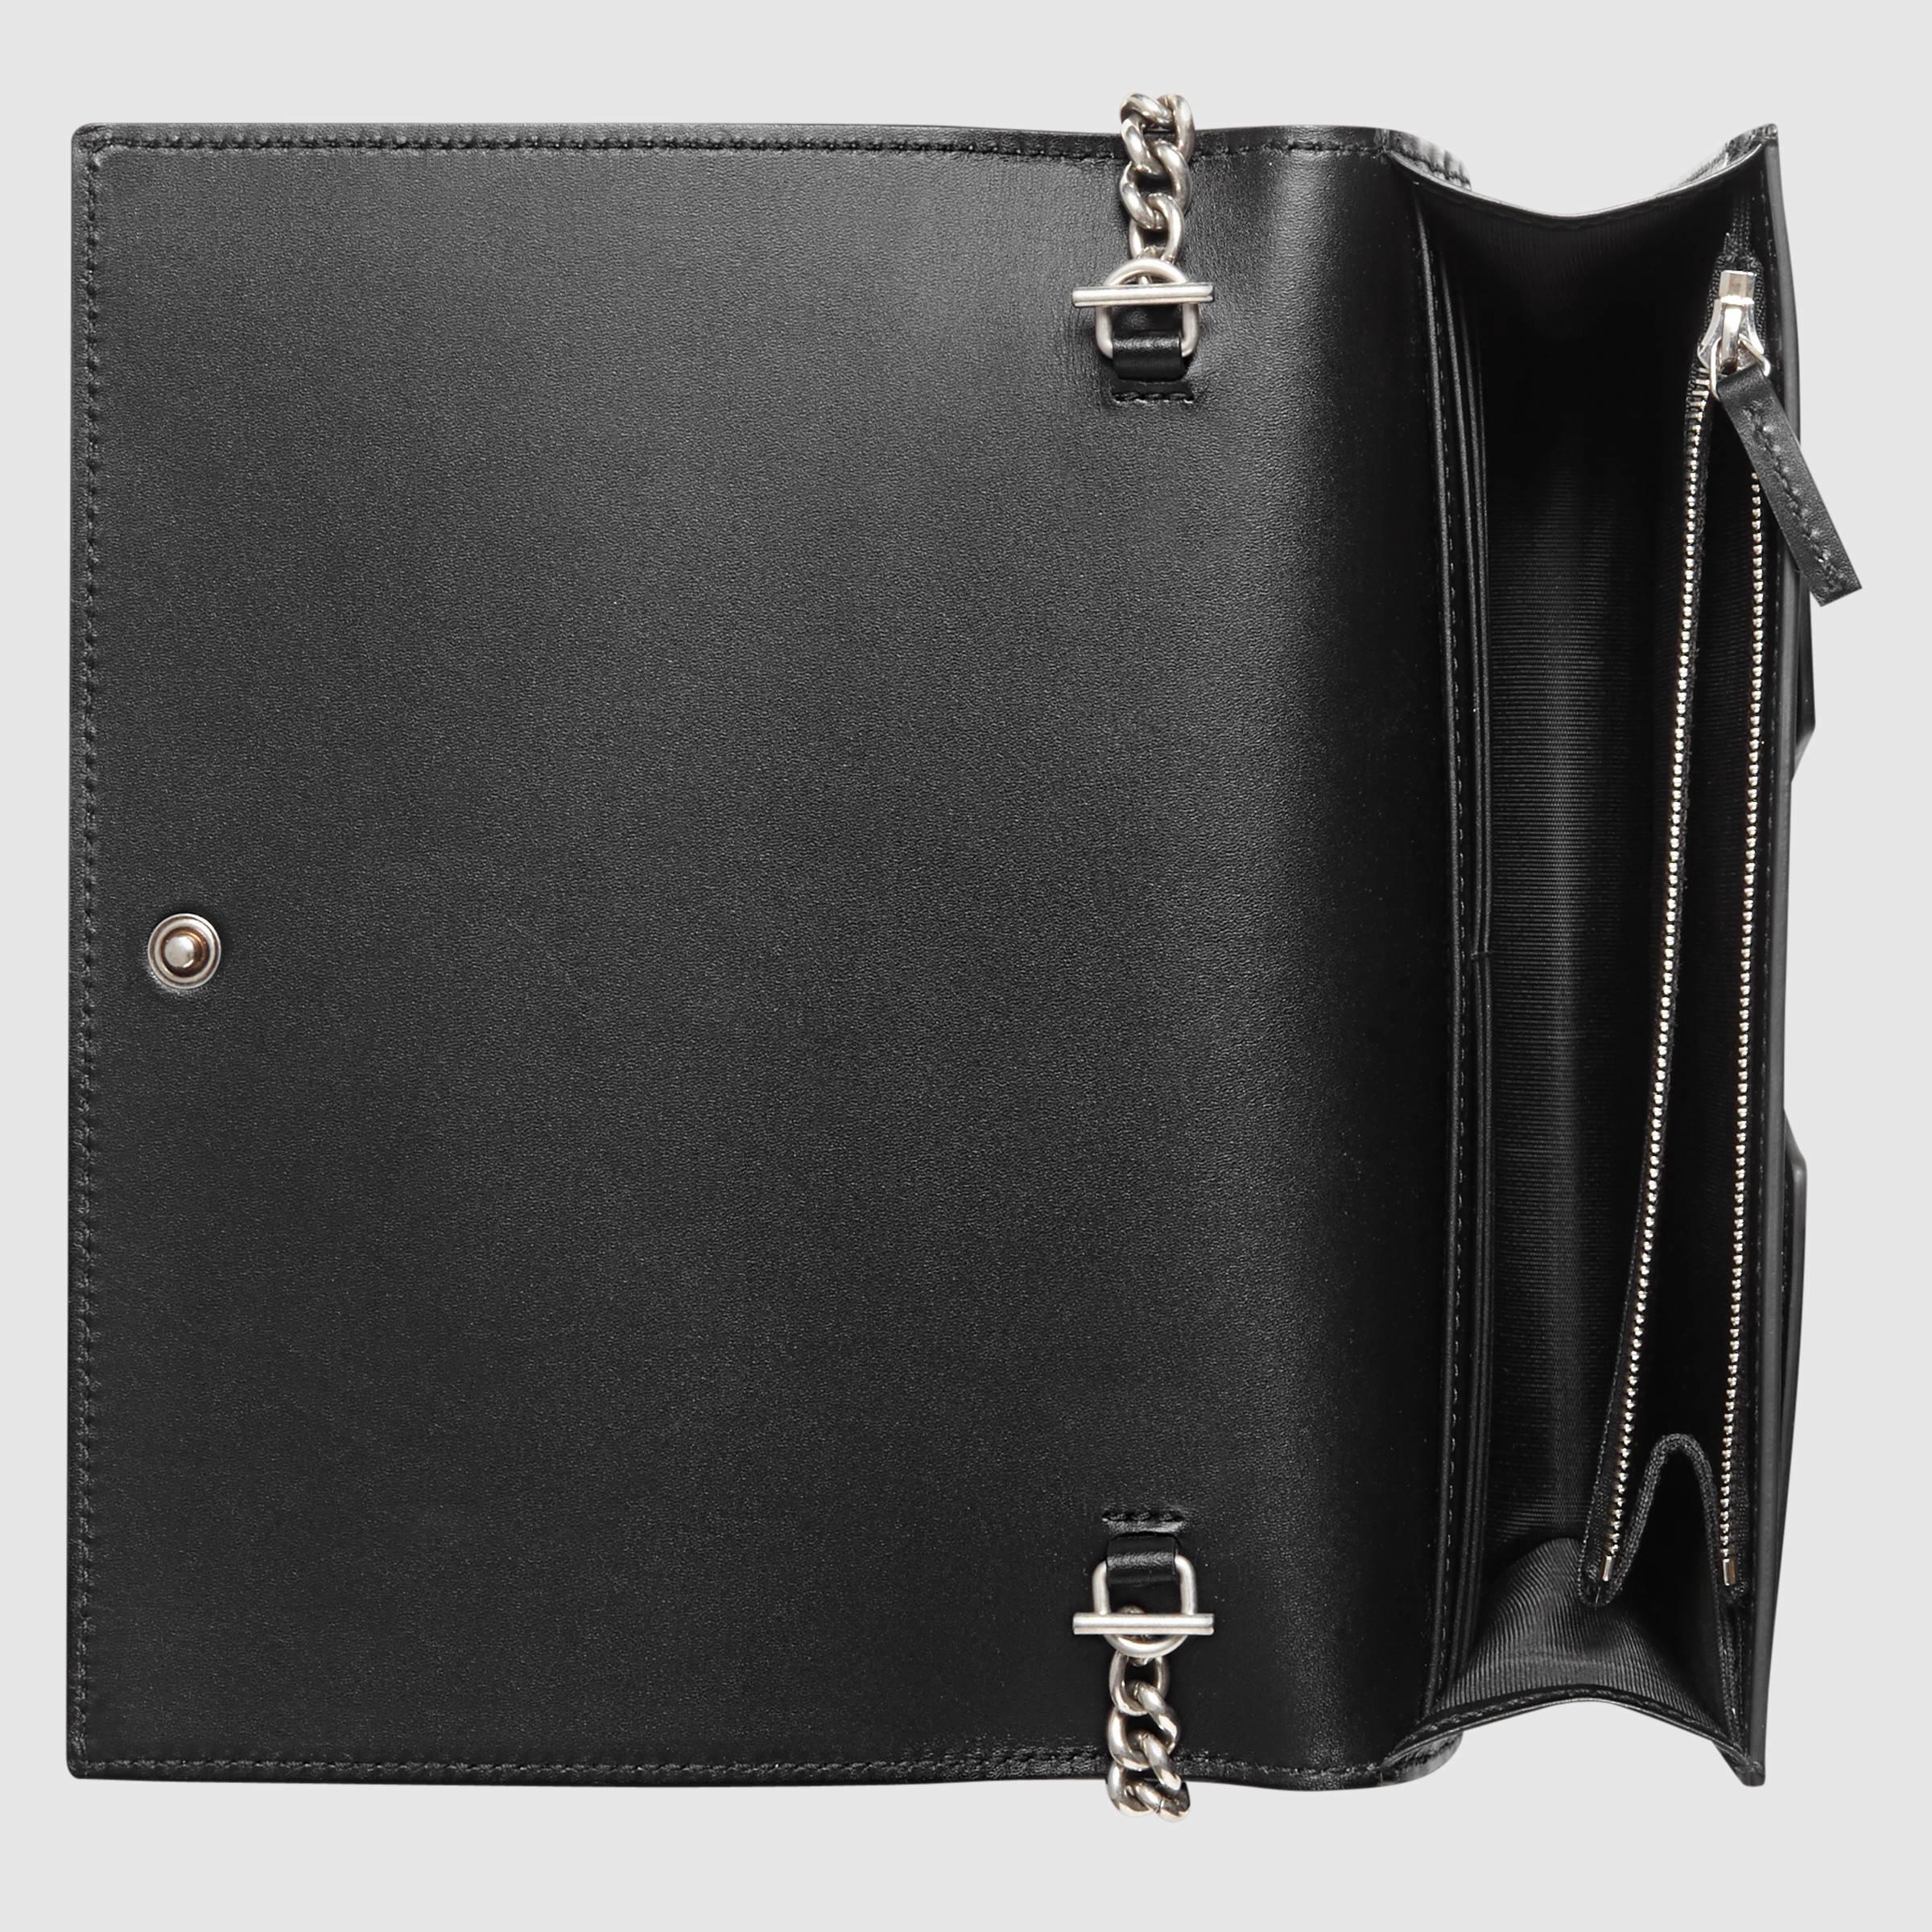 aa2cc0c7f57 Lyst - Gucci XL Leather Mini Shoulder Bag in Black